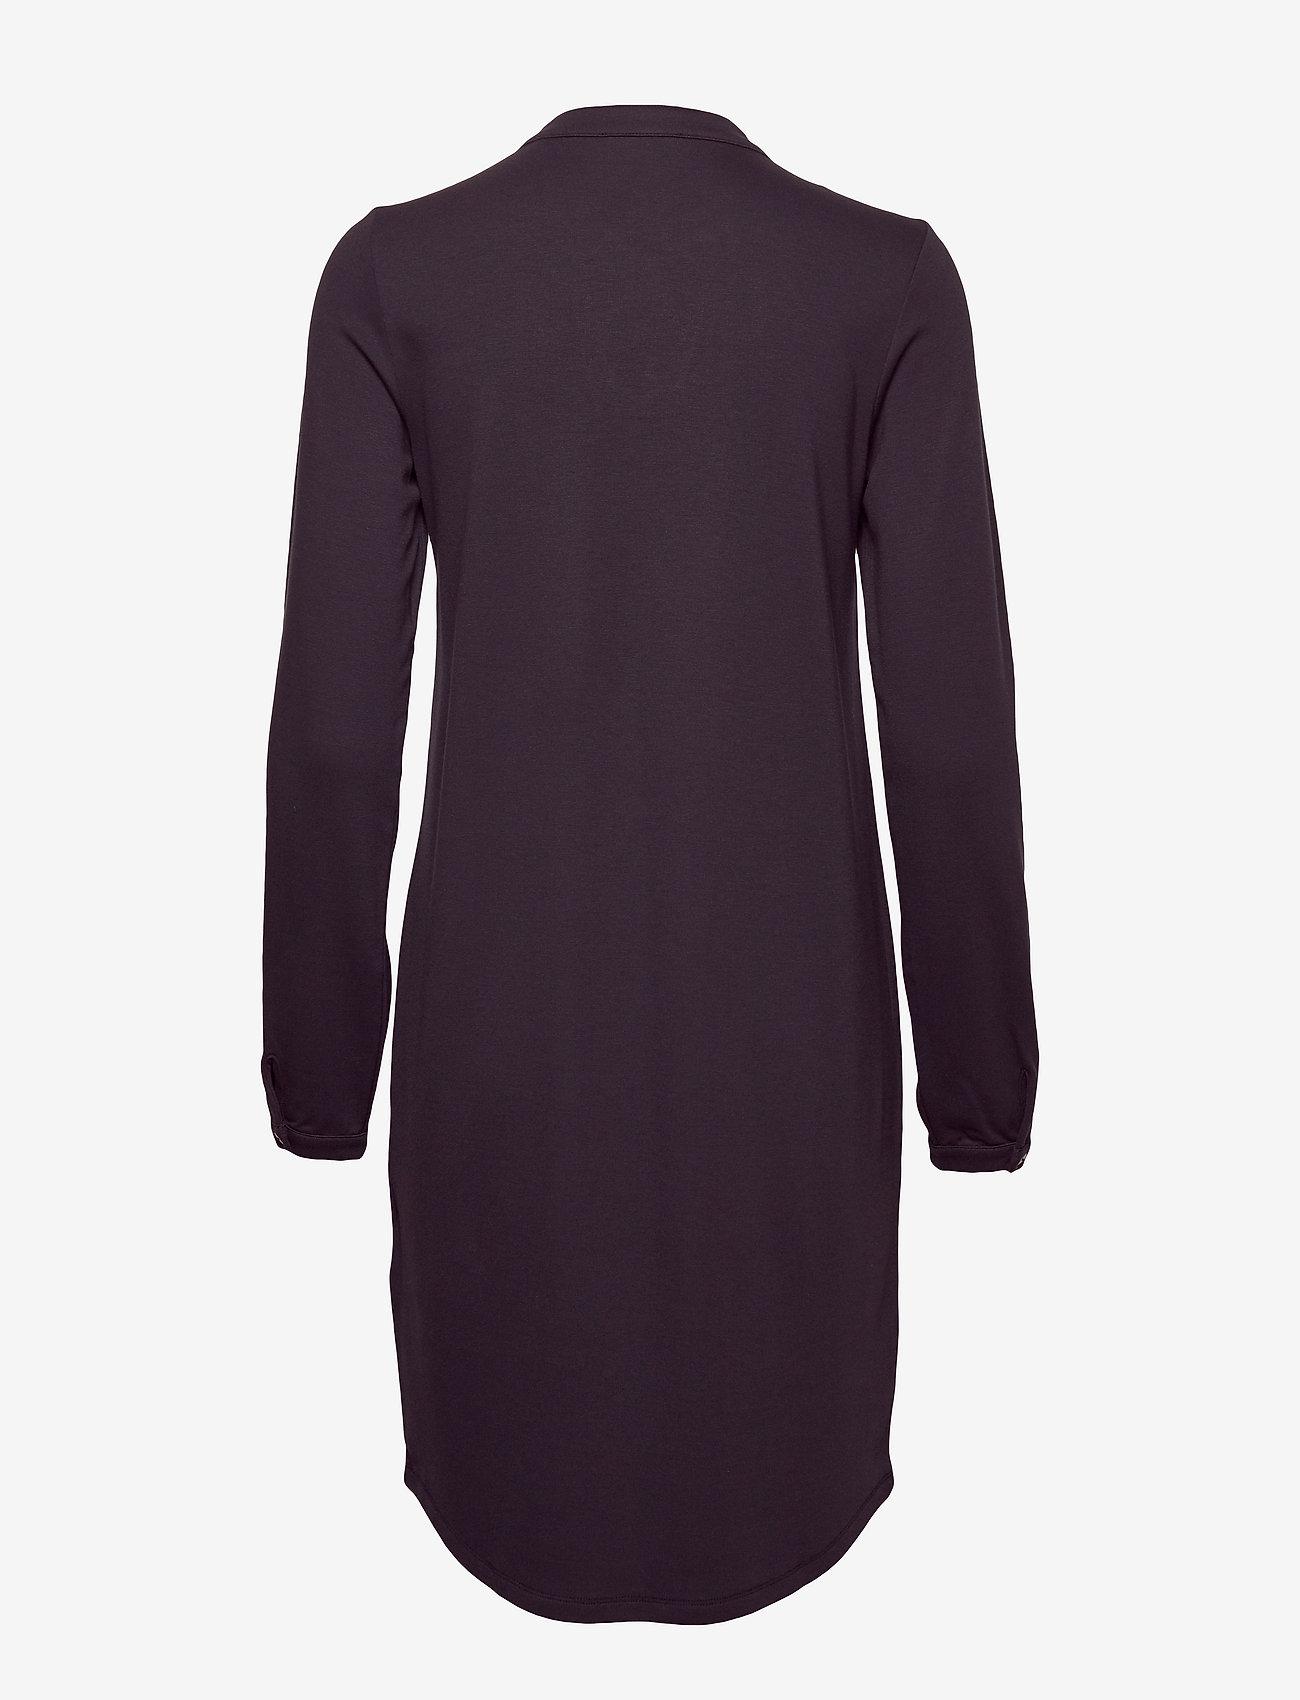 Jersey Dress, Long Sleeve, Placket (Midnight Sea) (1201.85 kr) - Marc O'Polo